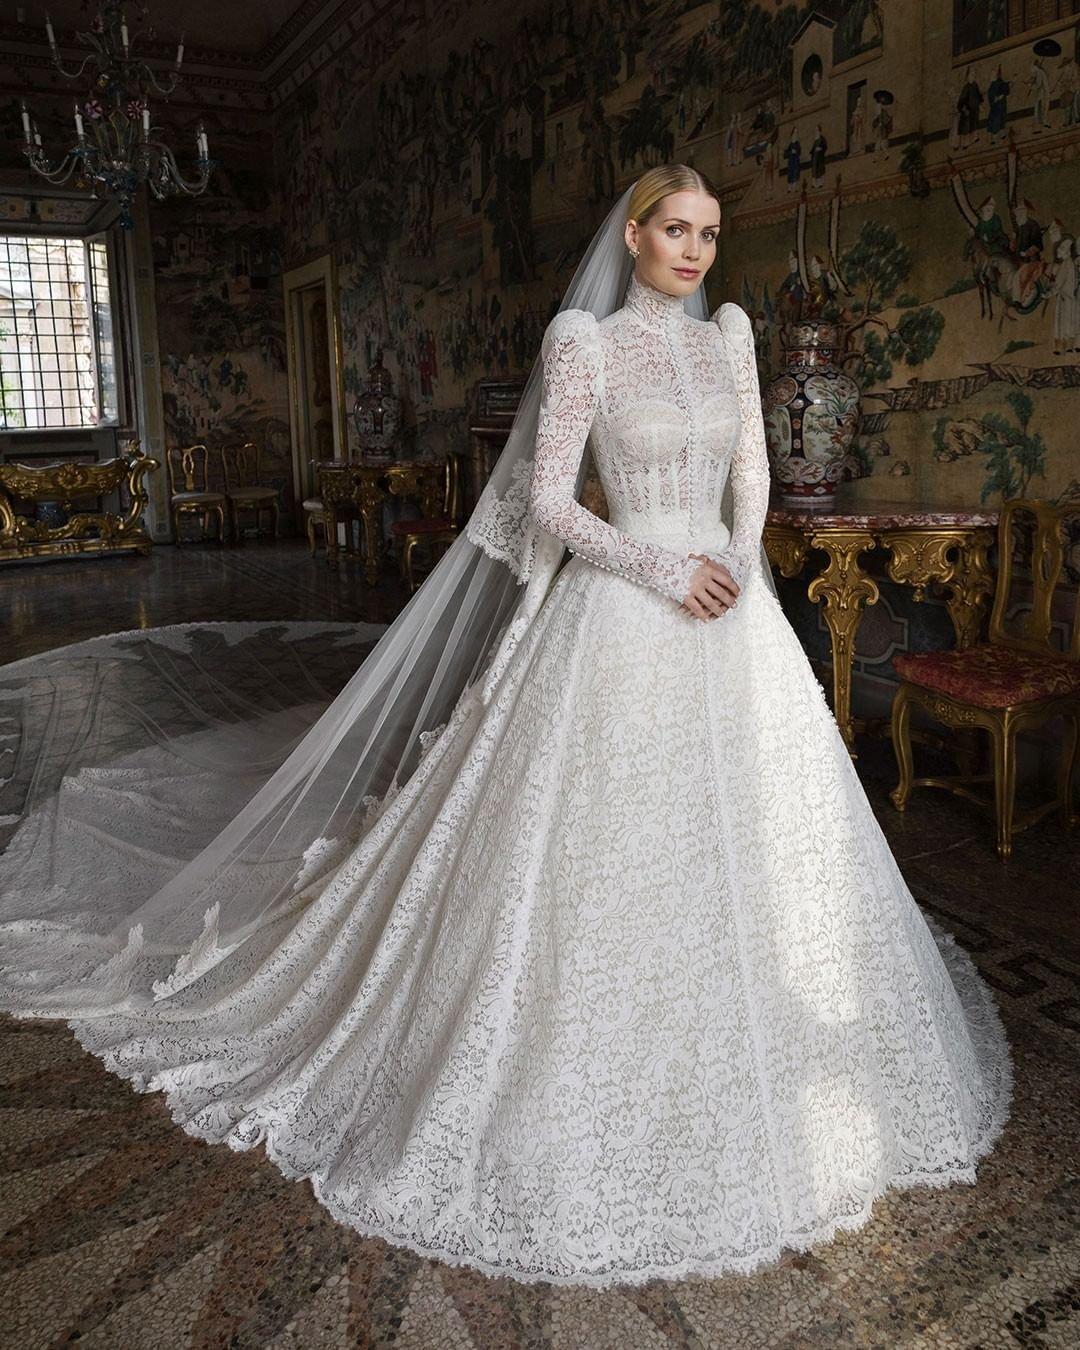 Lady Kitty Spencer wears Dolce & Gabbana on her wedding day, July 2021